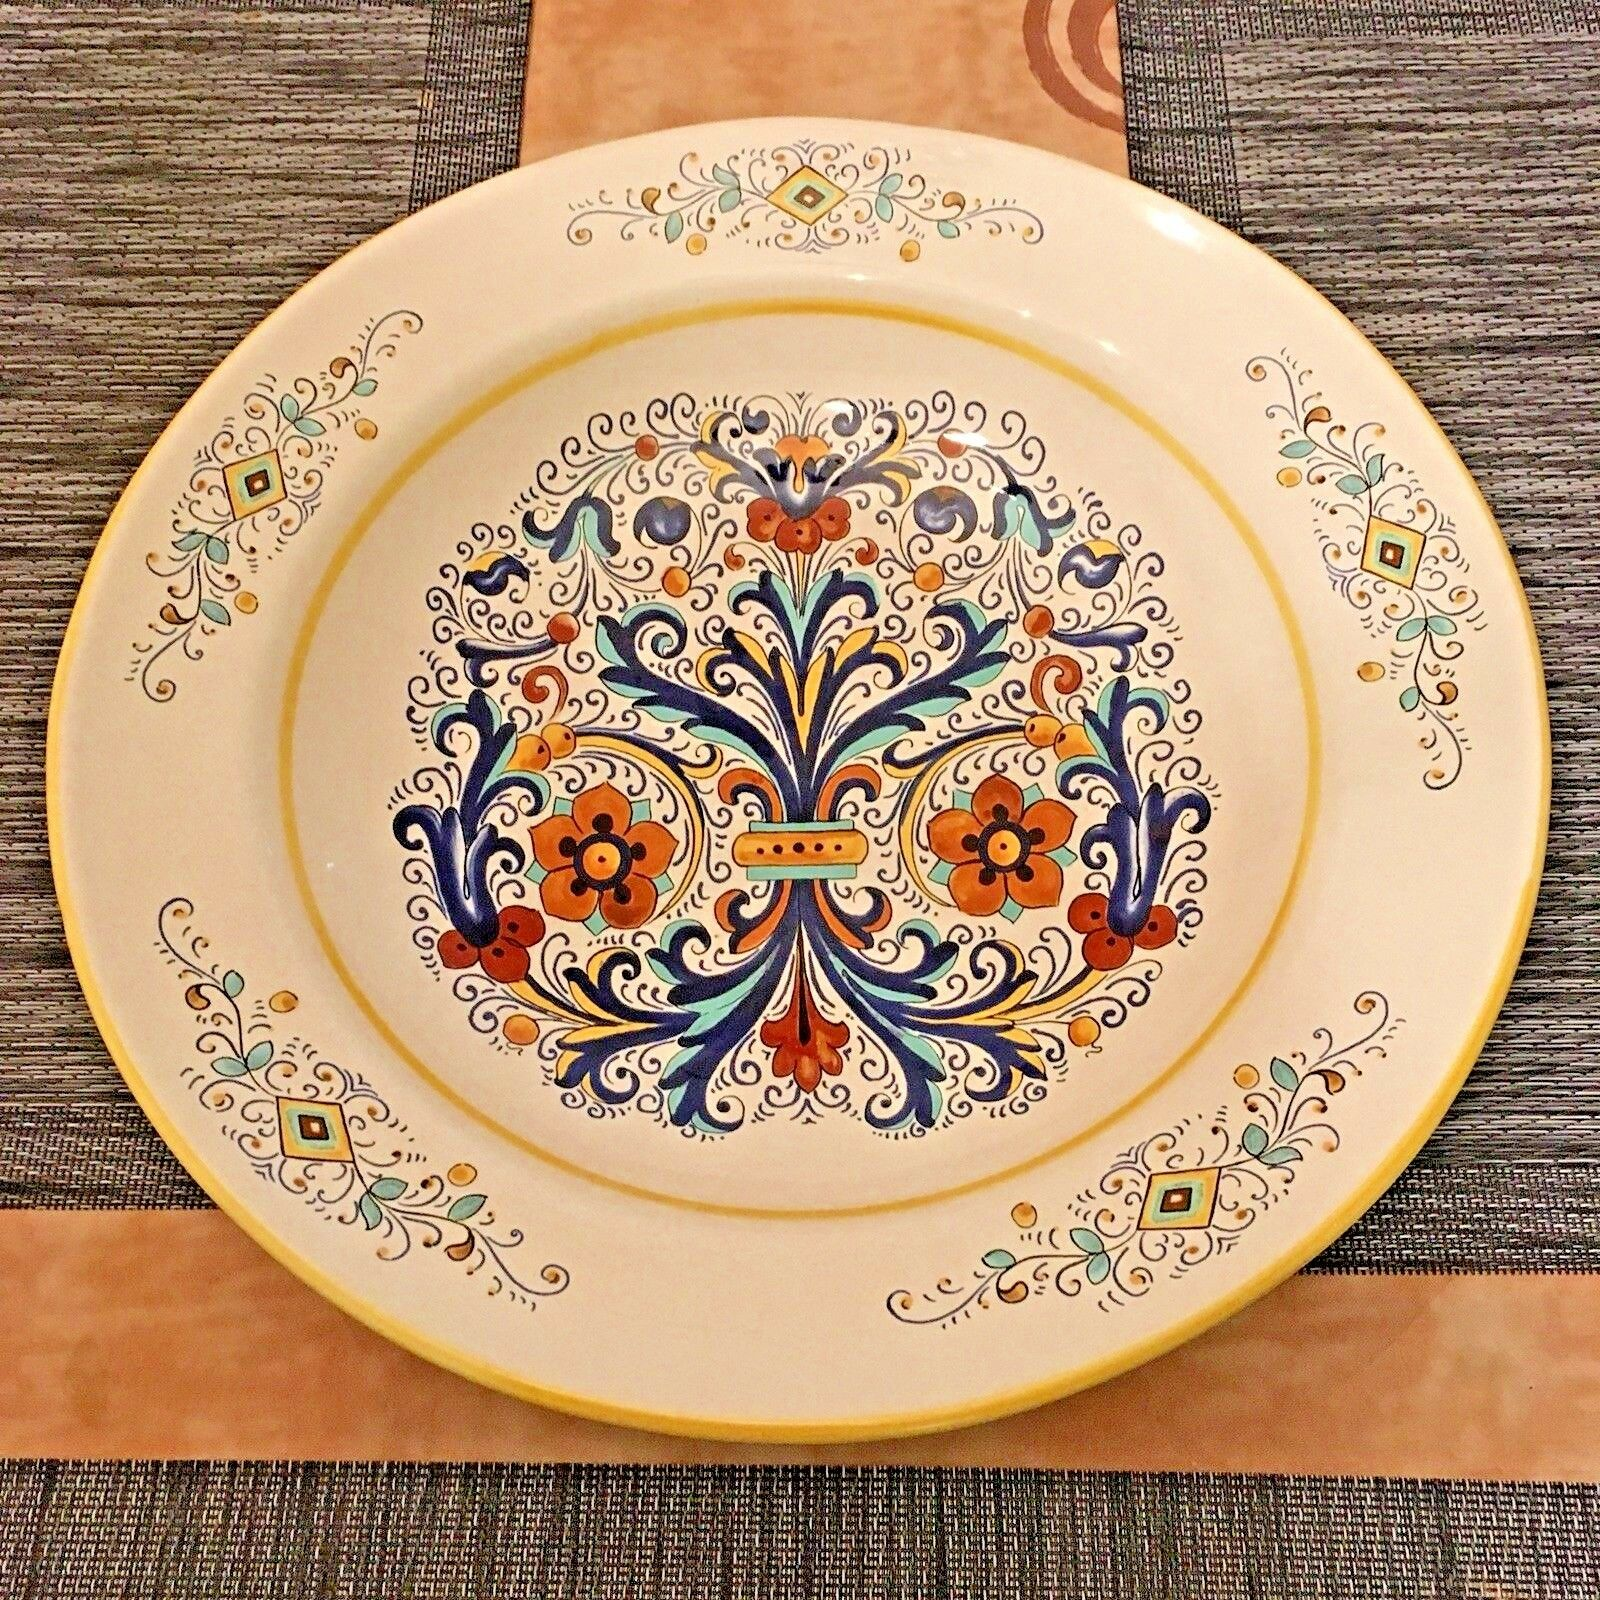 "DERUTA Deep Salad-Pasta Serving plate - 15"" - Nice Condition - Made in ."